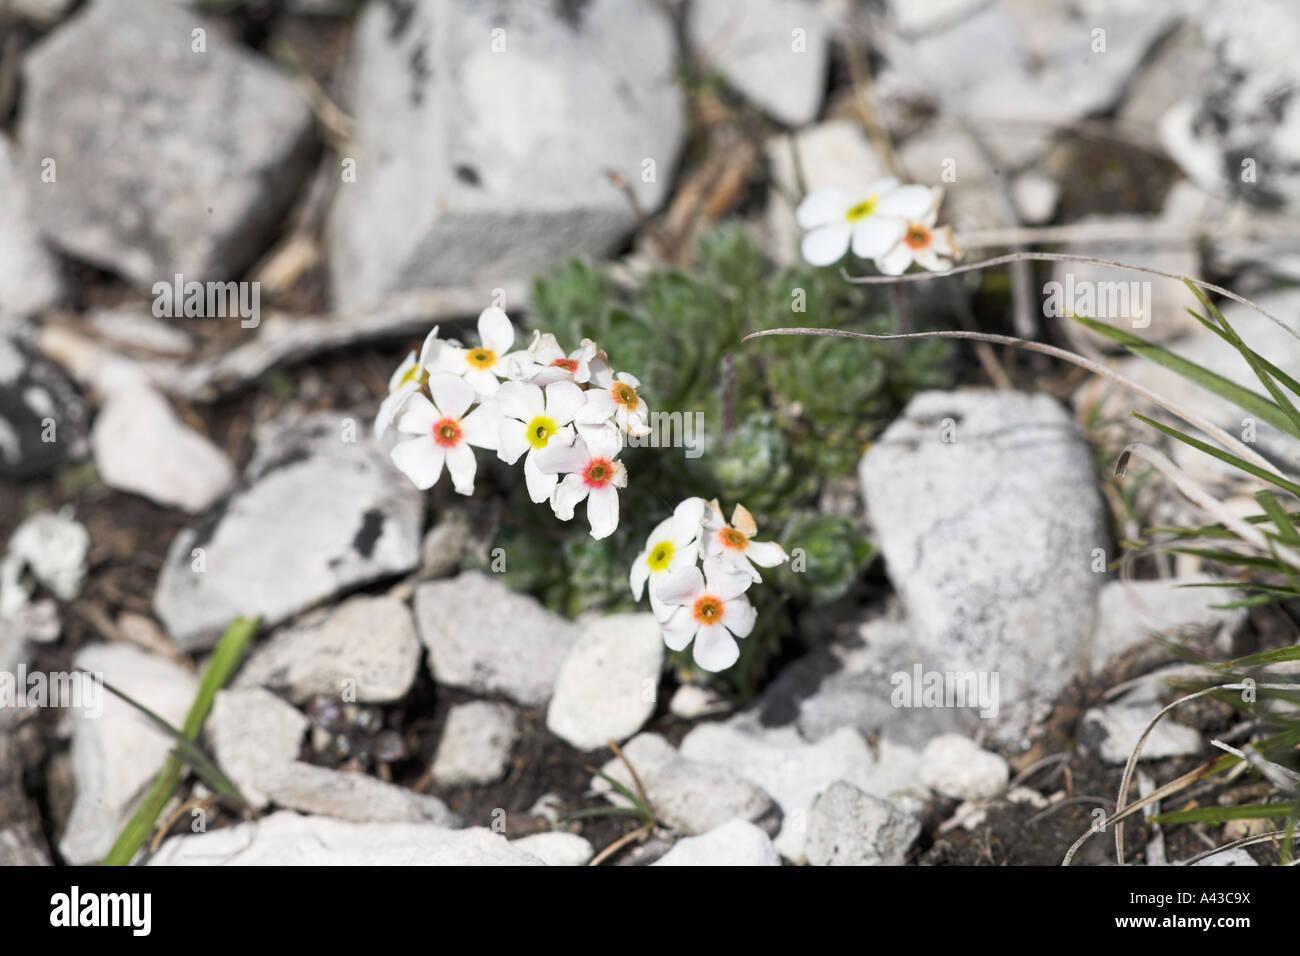 Ciliato rock gelsomino Androsace chamaejasme Font d Urle Vercors Parco Nazionale di Francia Immagini Stock